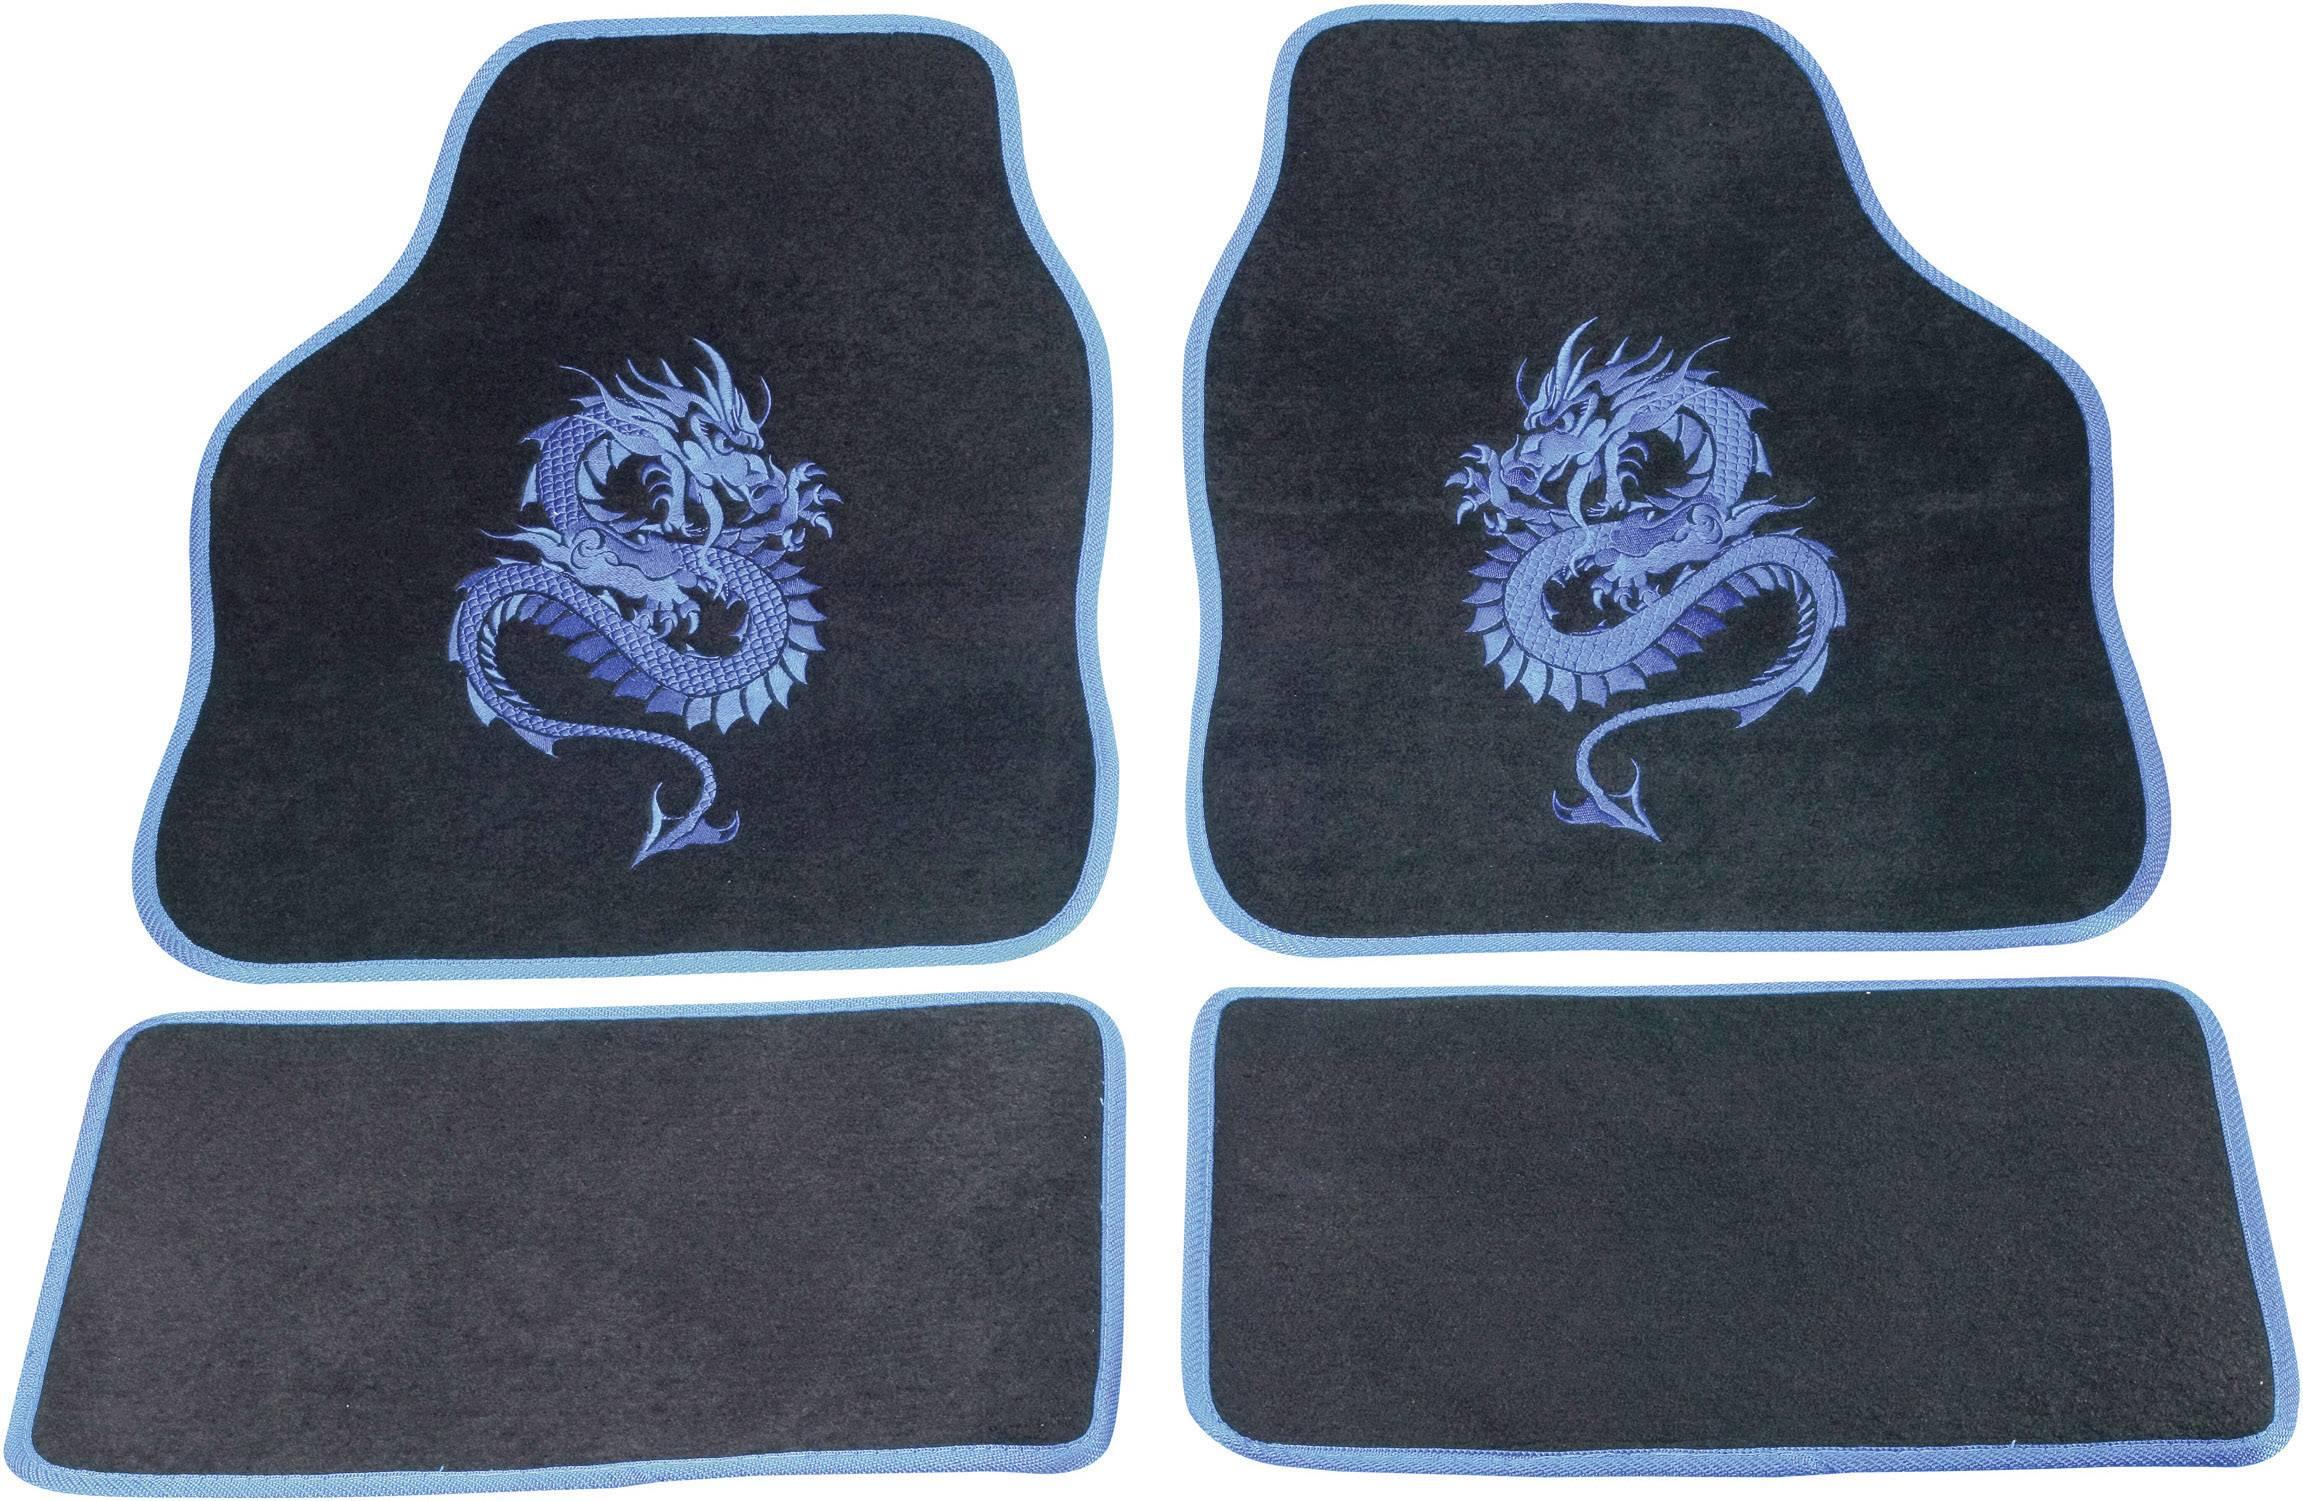 Rohožka (univerzálna) do auta cartrend 1400-01 1400-01, textil, modrá